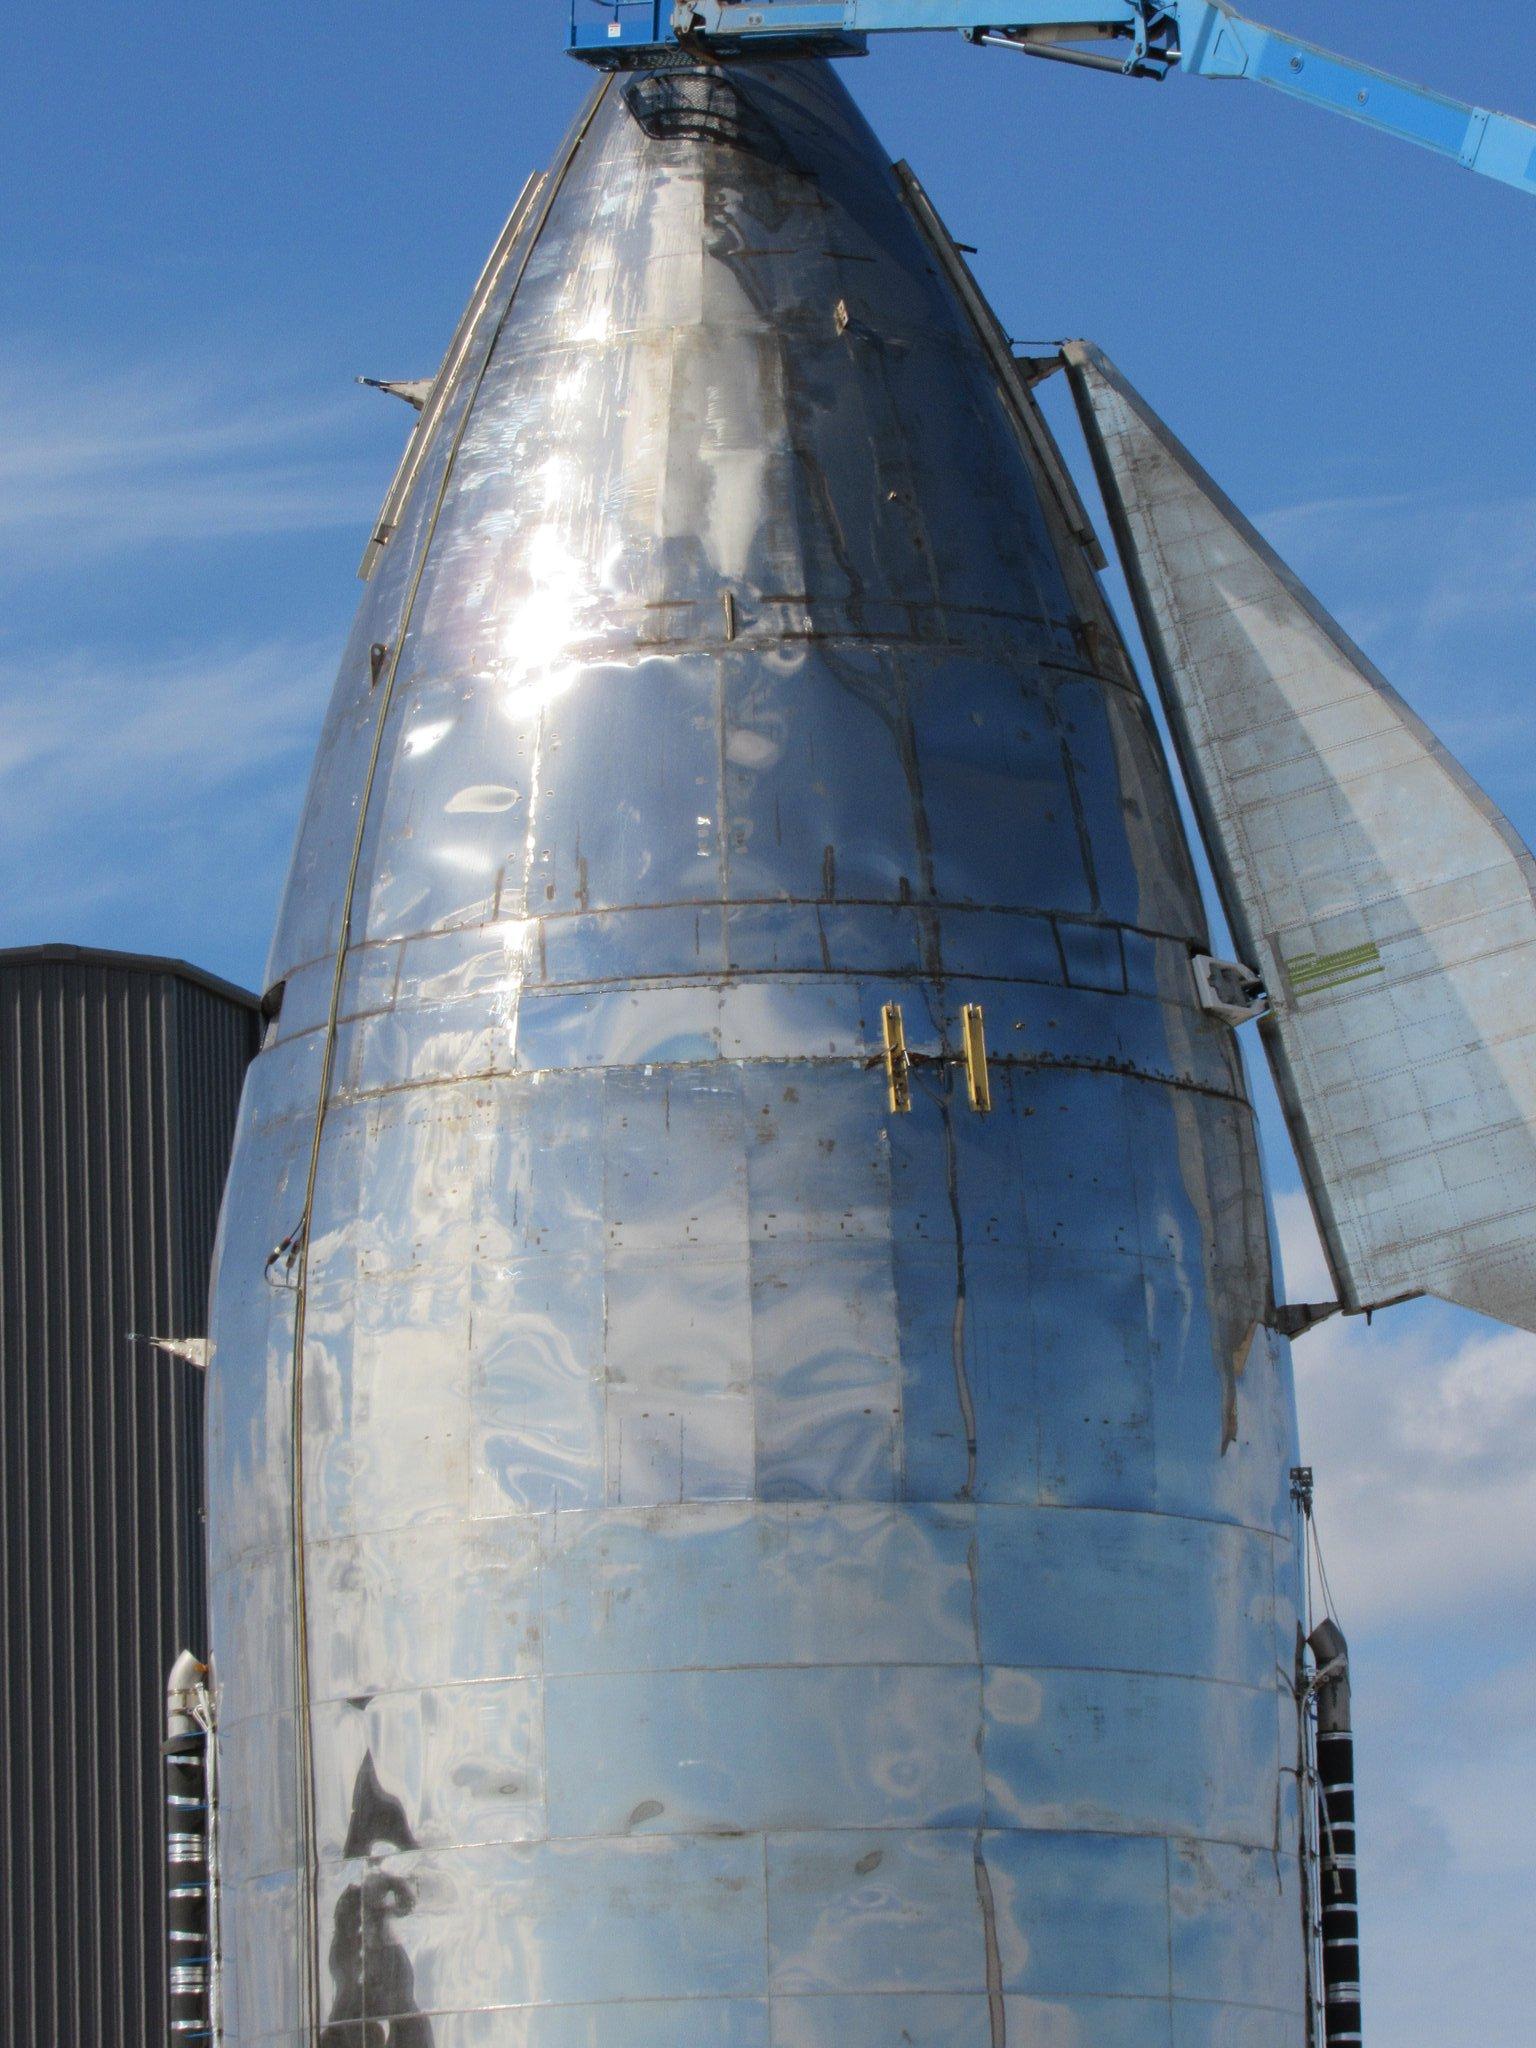 Starship Mk1 (Boca Chica) - Page 32 EIeUef1WsAEy-x3?format=jpg&name=4096x4096